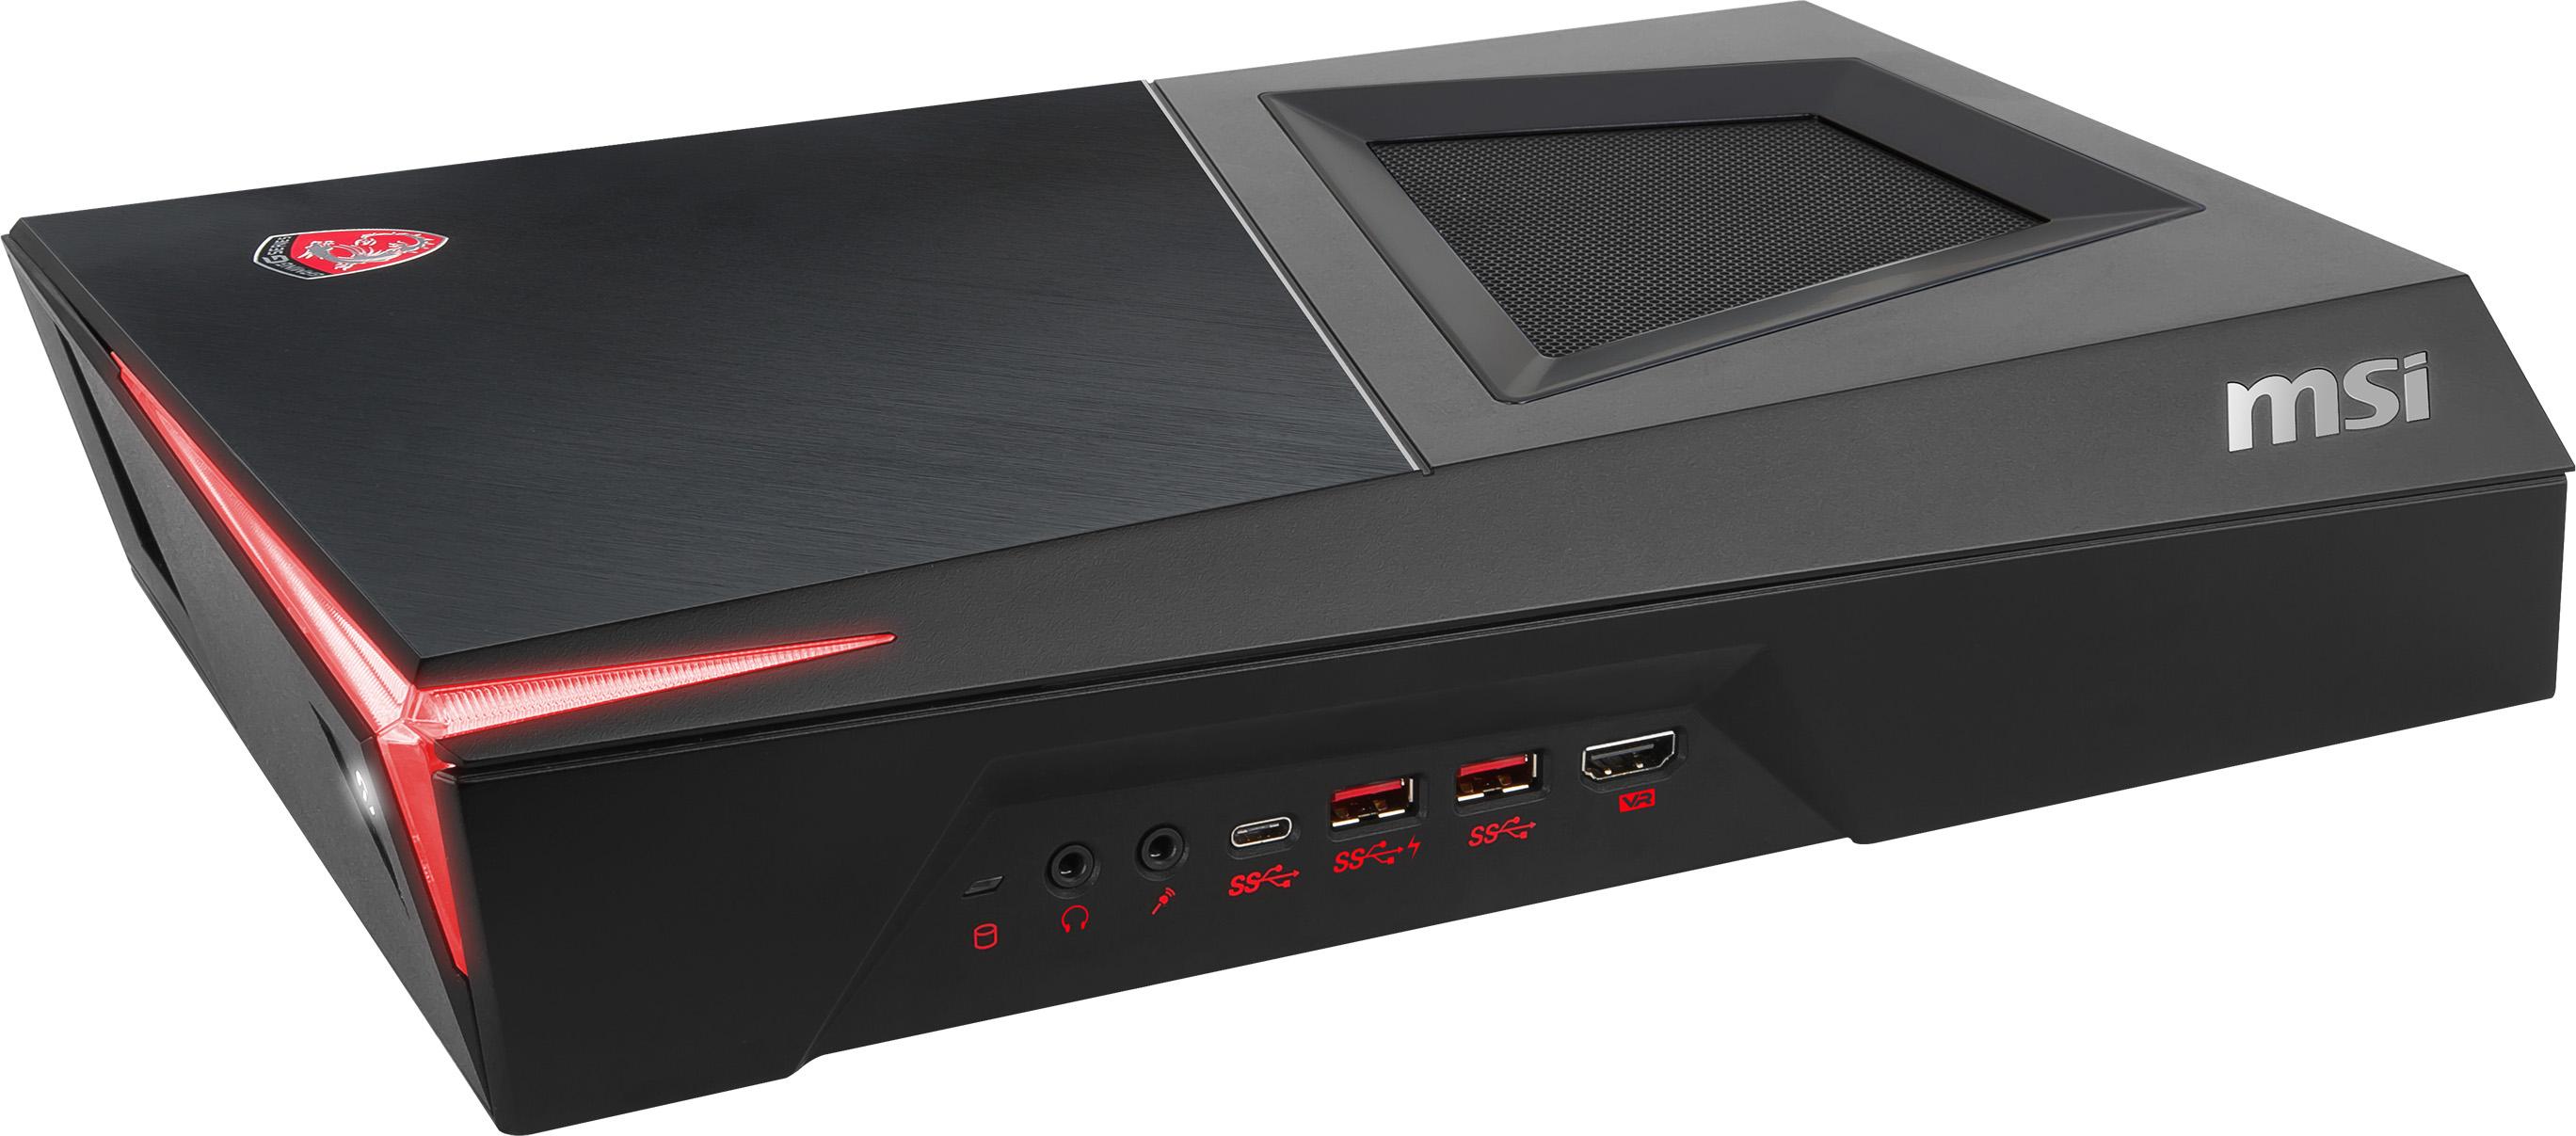 MSI Trident 3 VR7RC-028US Signature Edition Gaming Desktop Deal